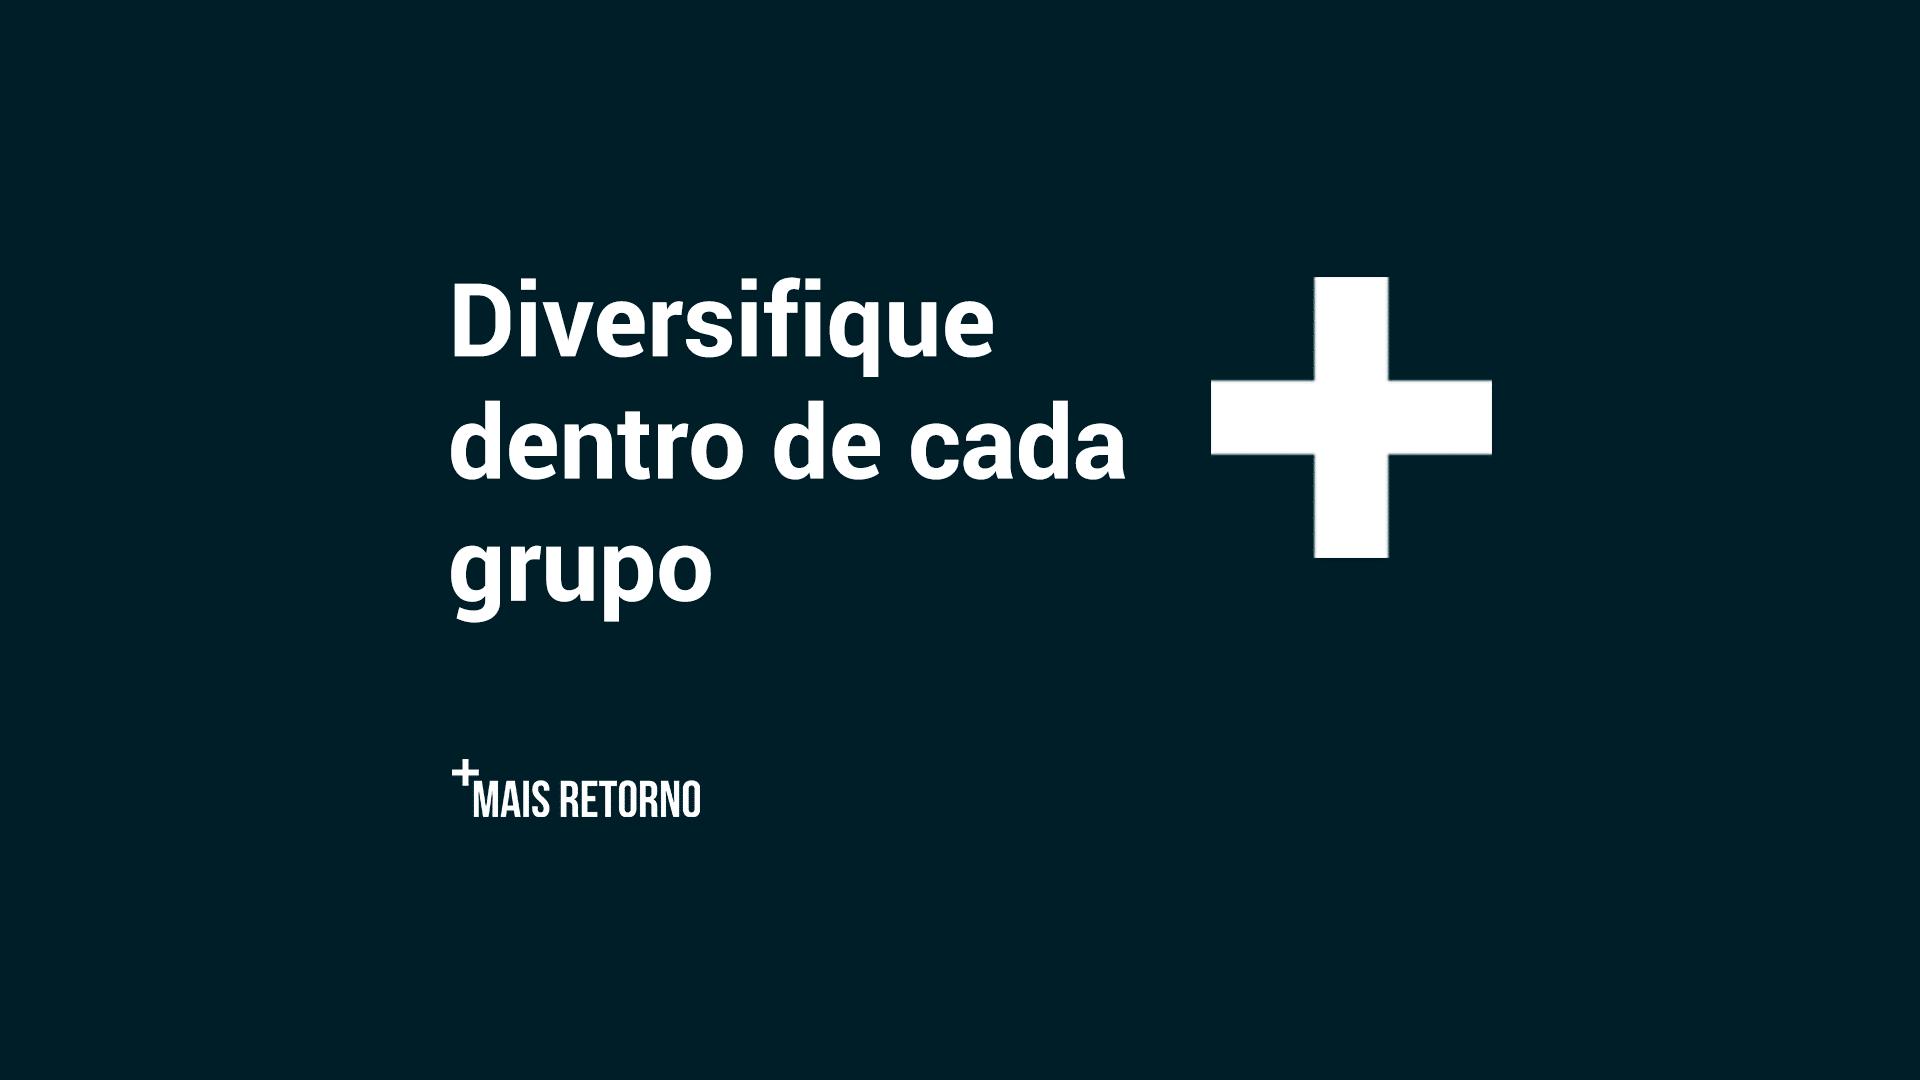 Diversifique dentro de cada grupo